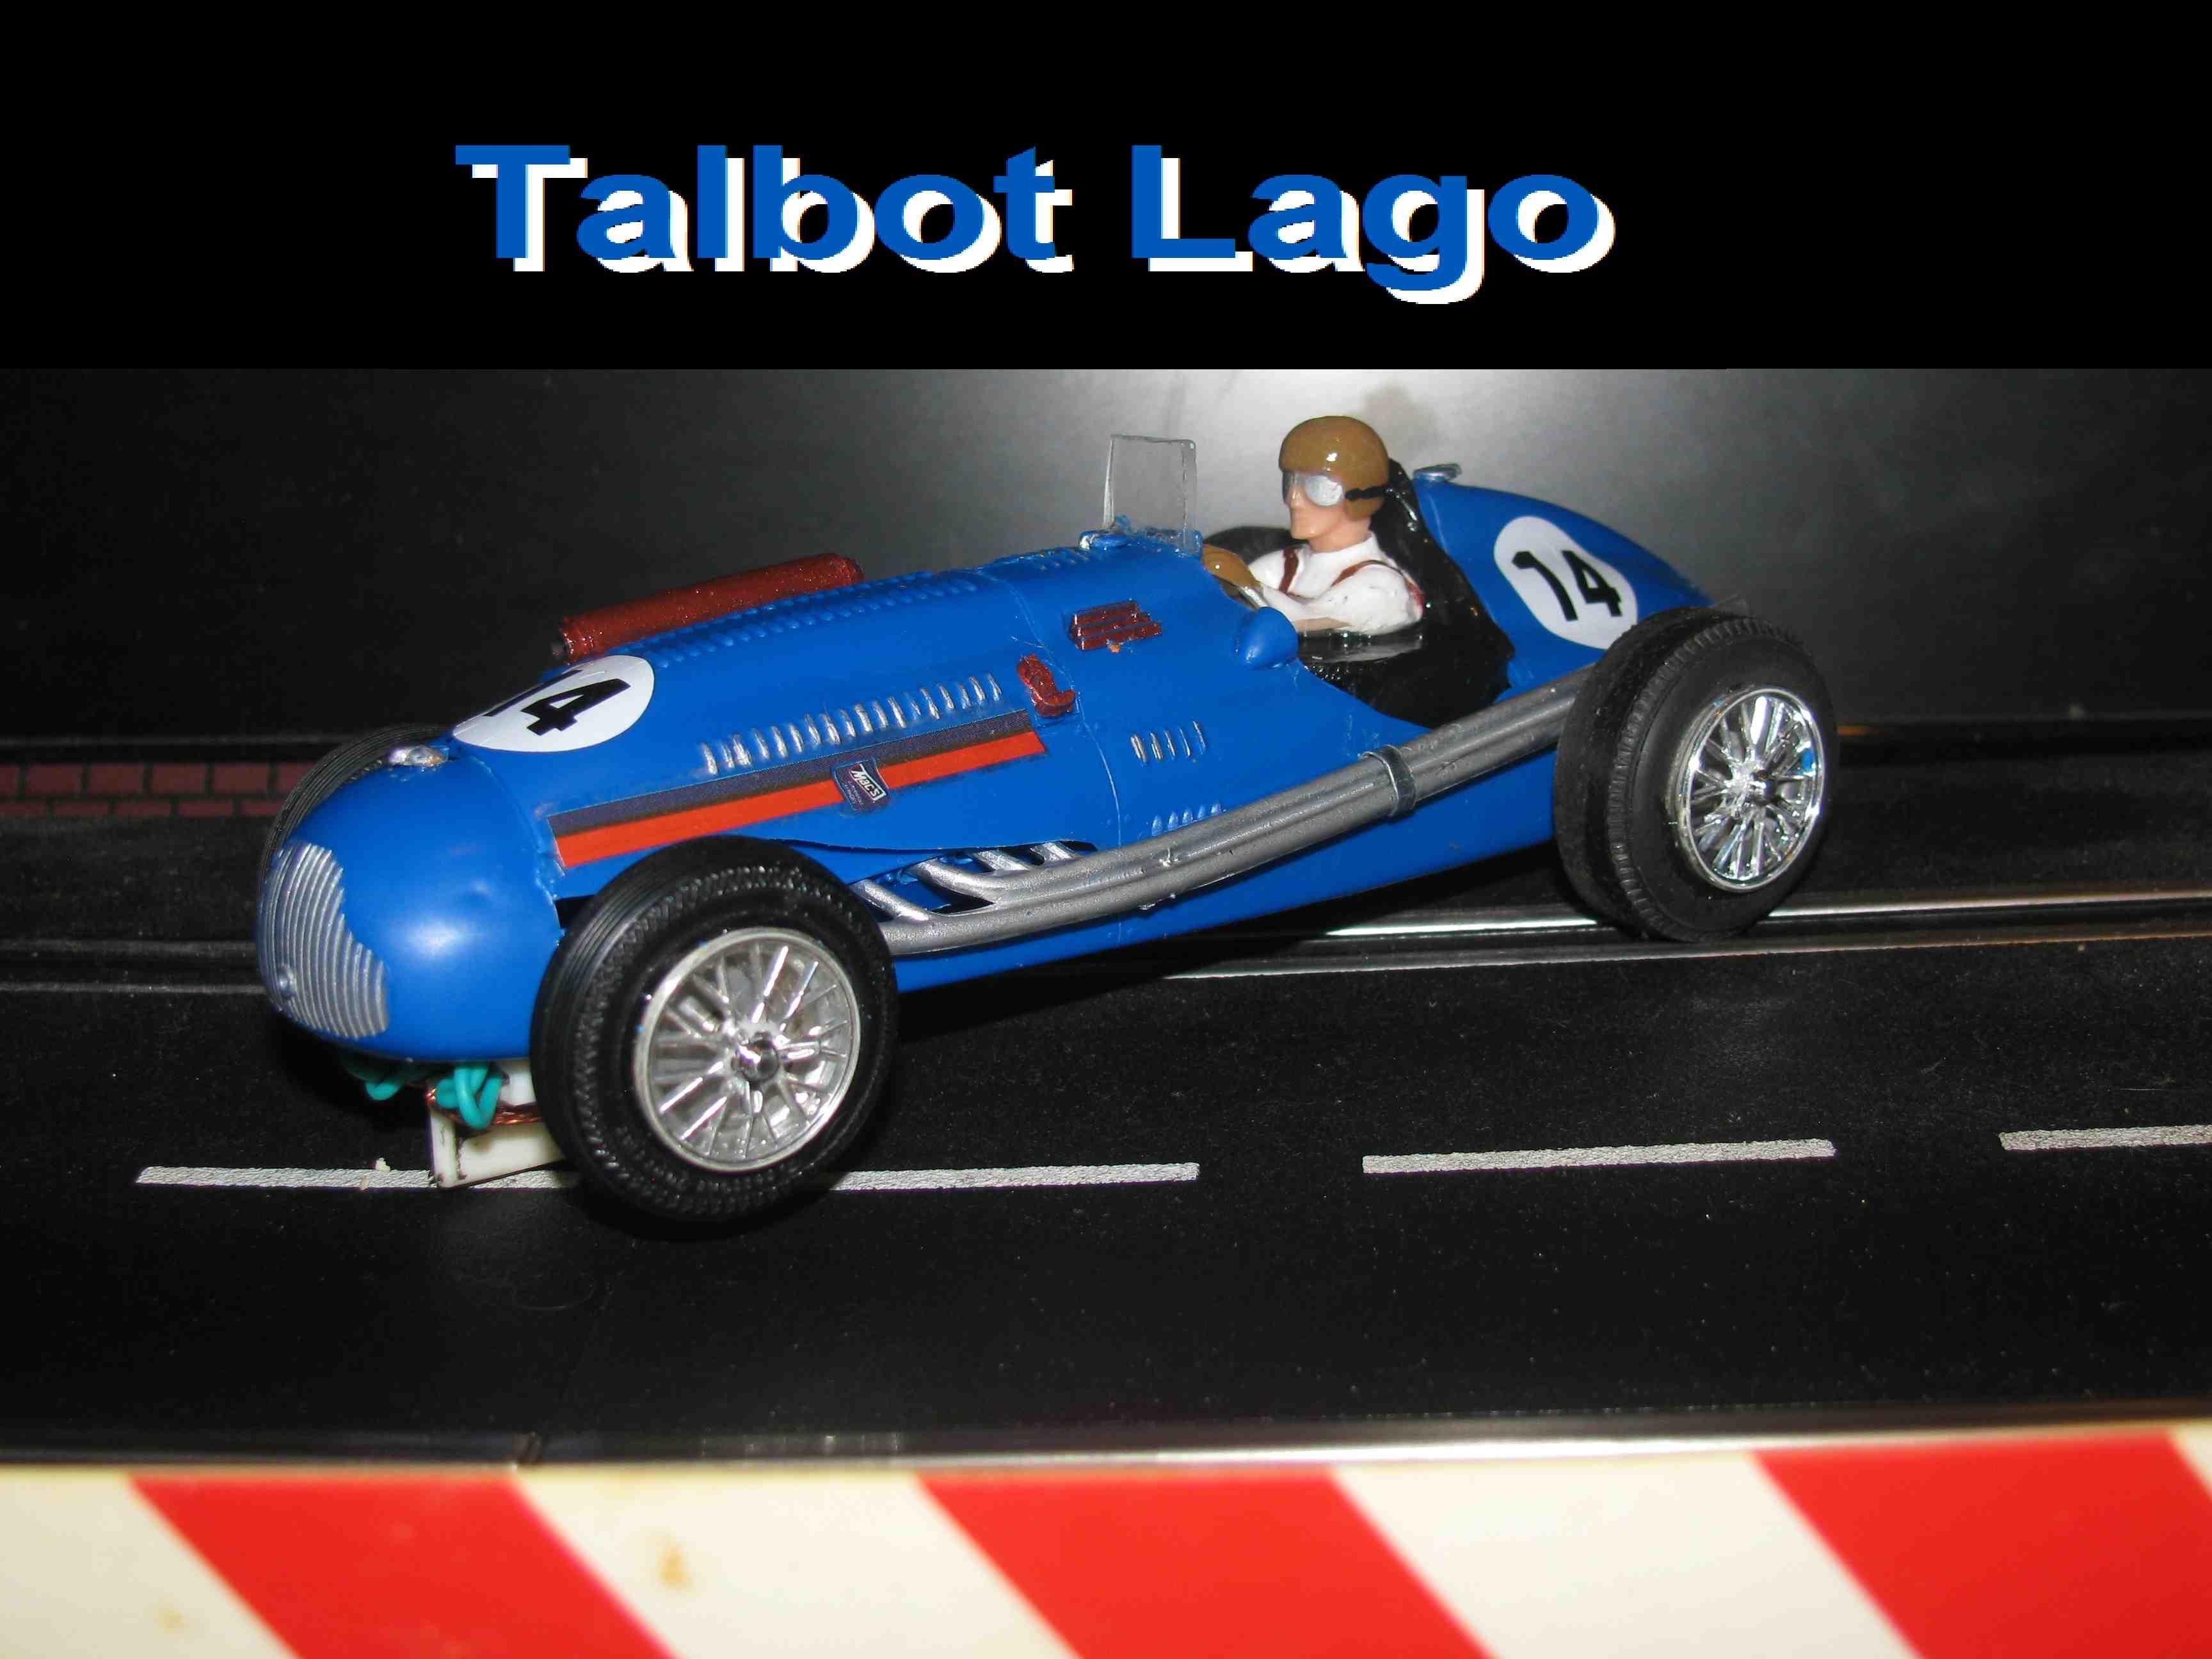 1949 Talbot Lago 150-SS 1/24 Slot Car The Talbot Logo 4.5 liter GP won the 1947, 1949, 1950 & 1951 Grand Prix Races